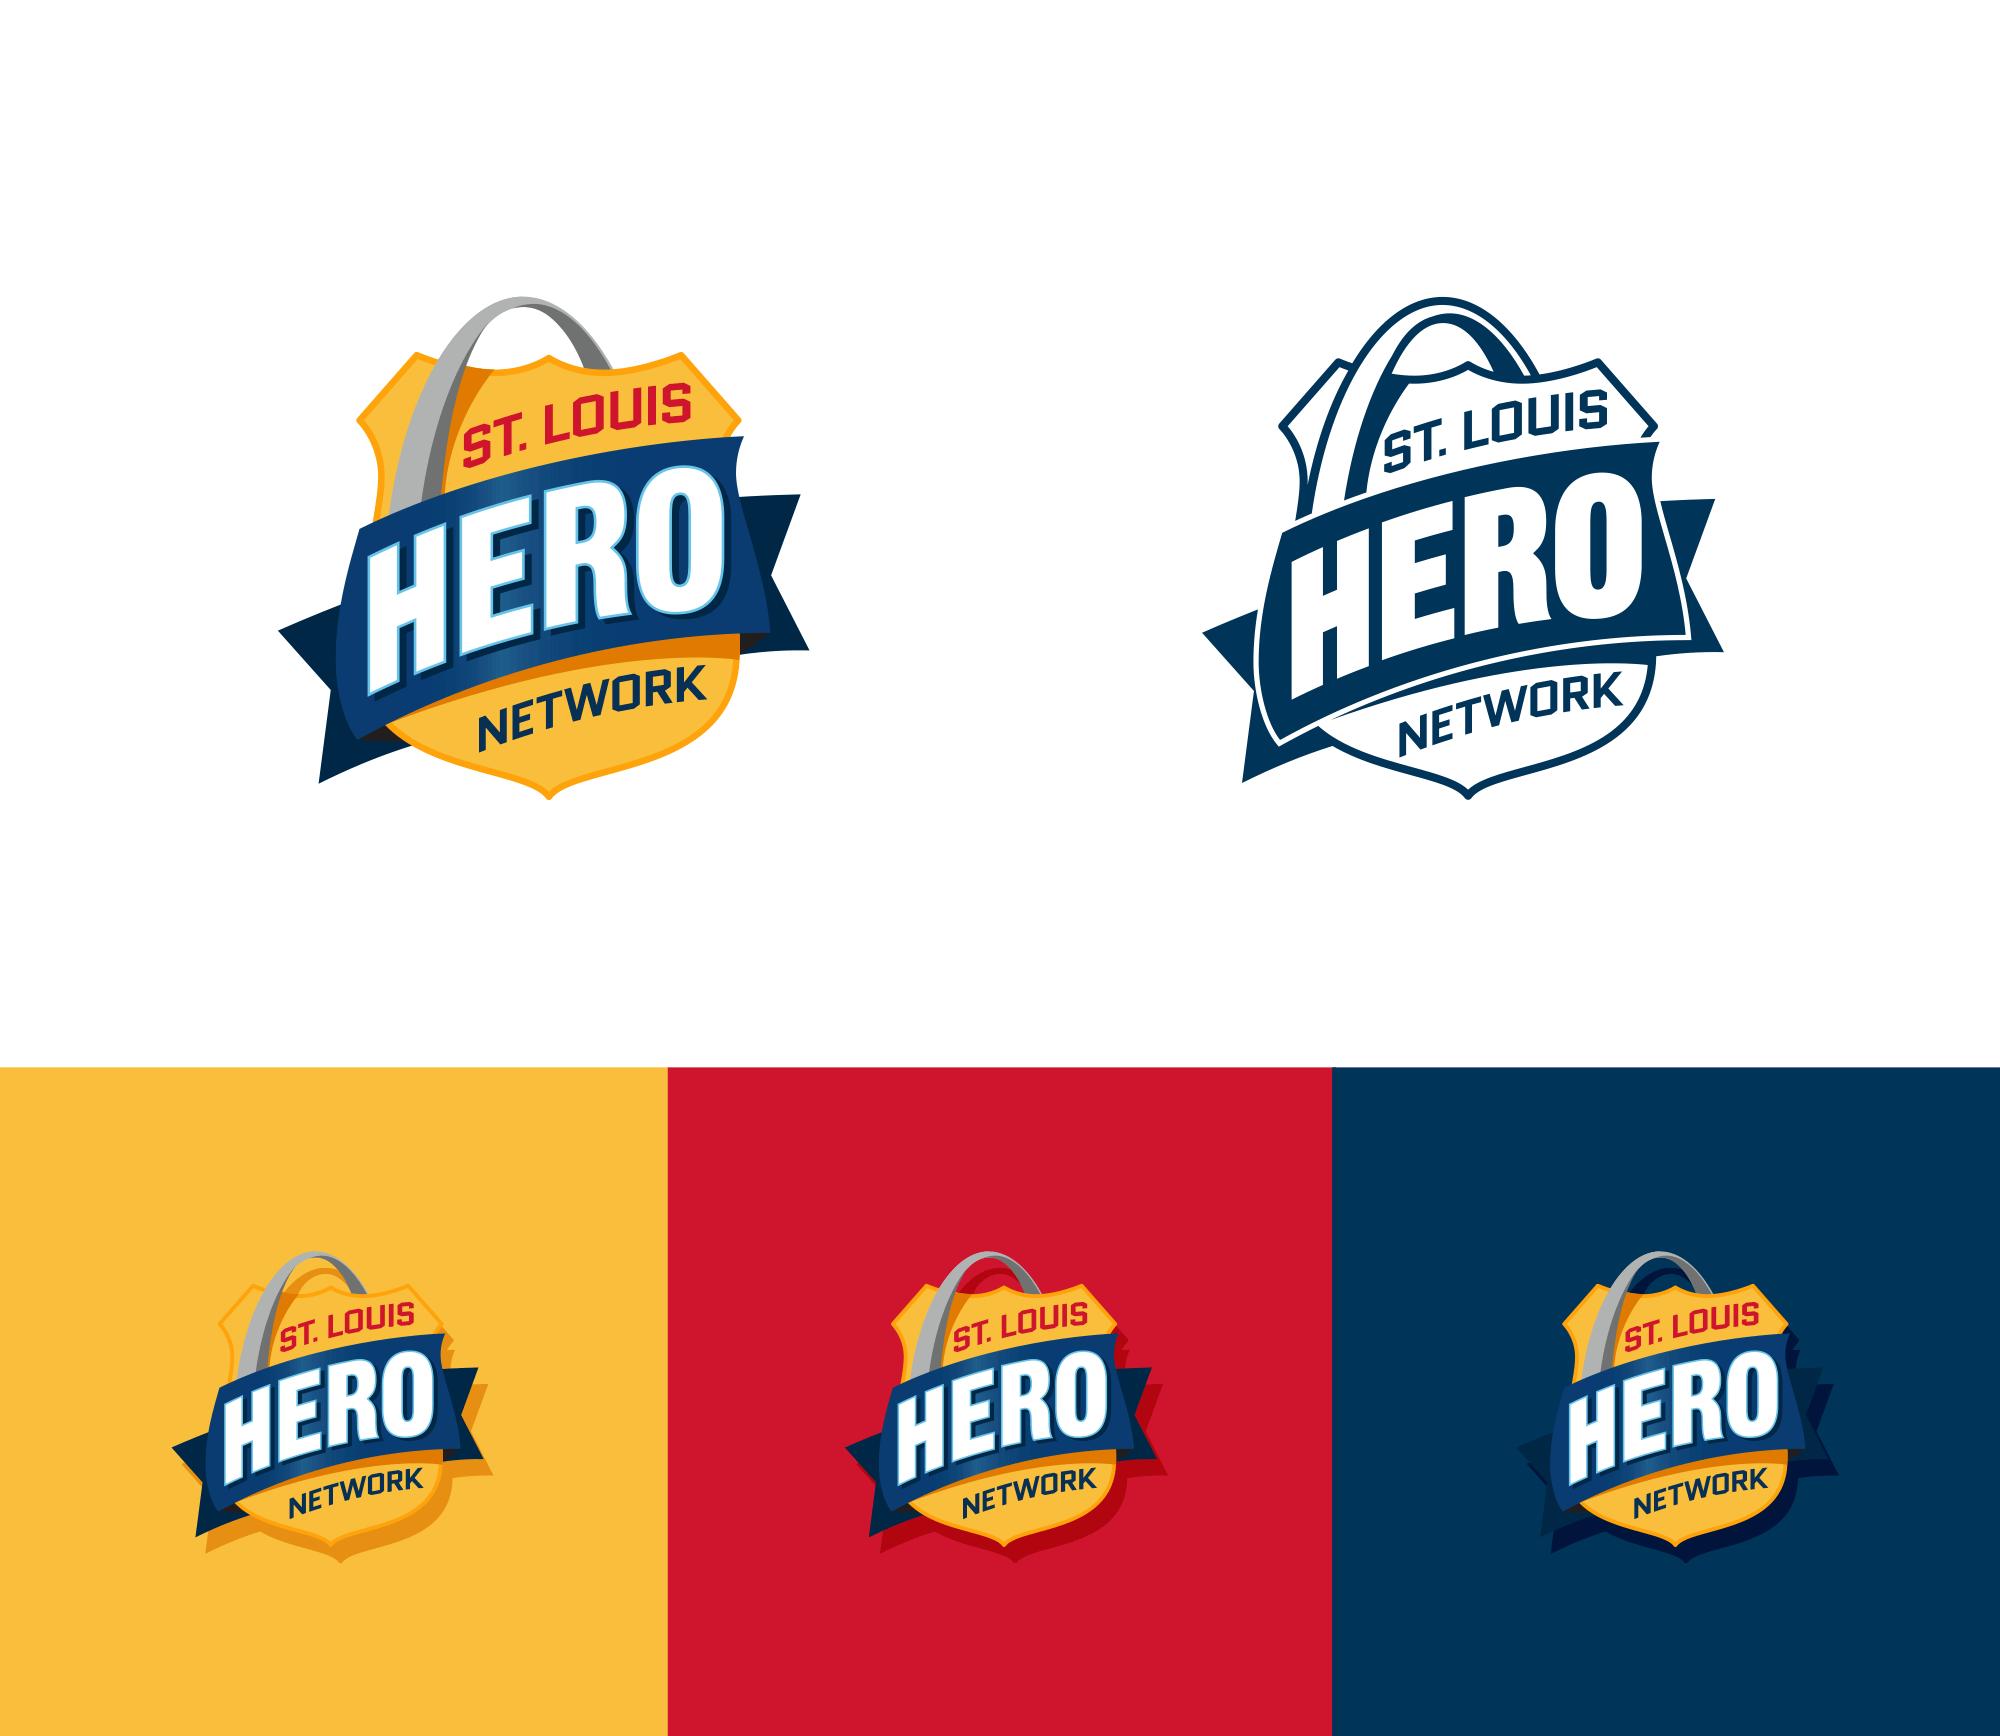 hero-logo-design